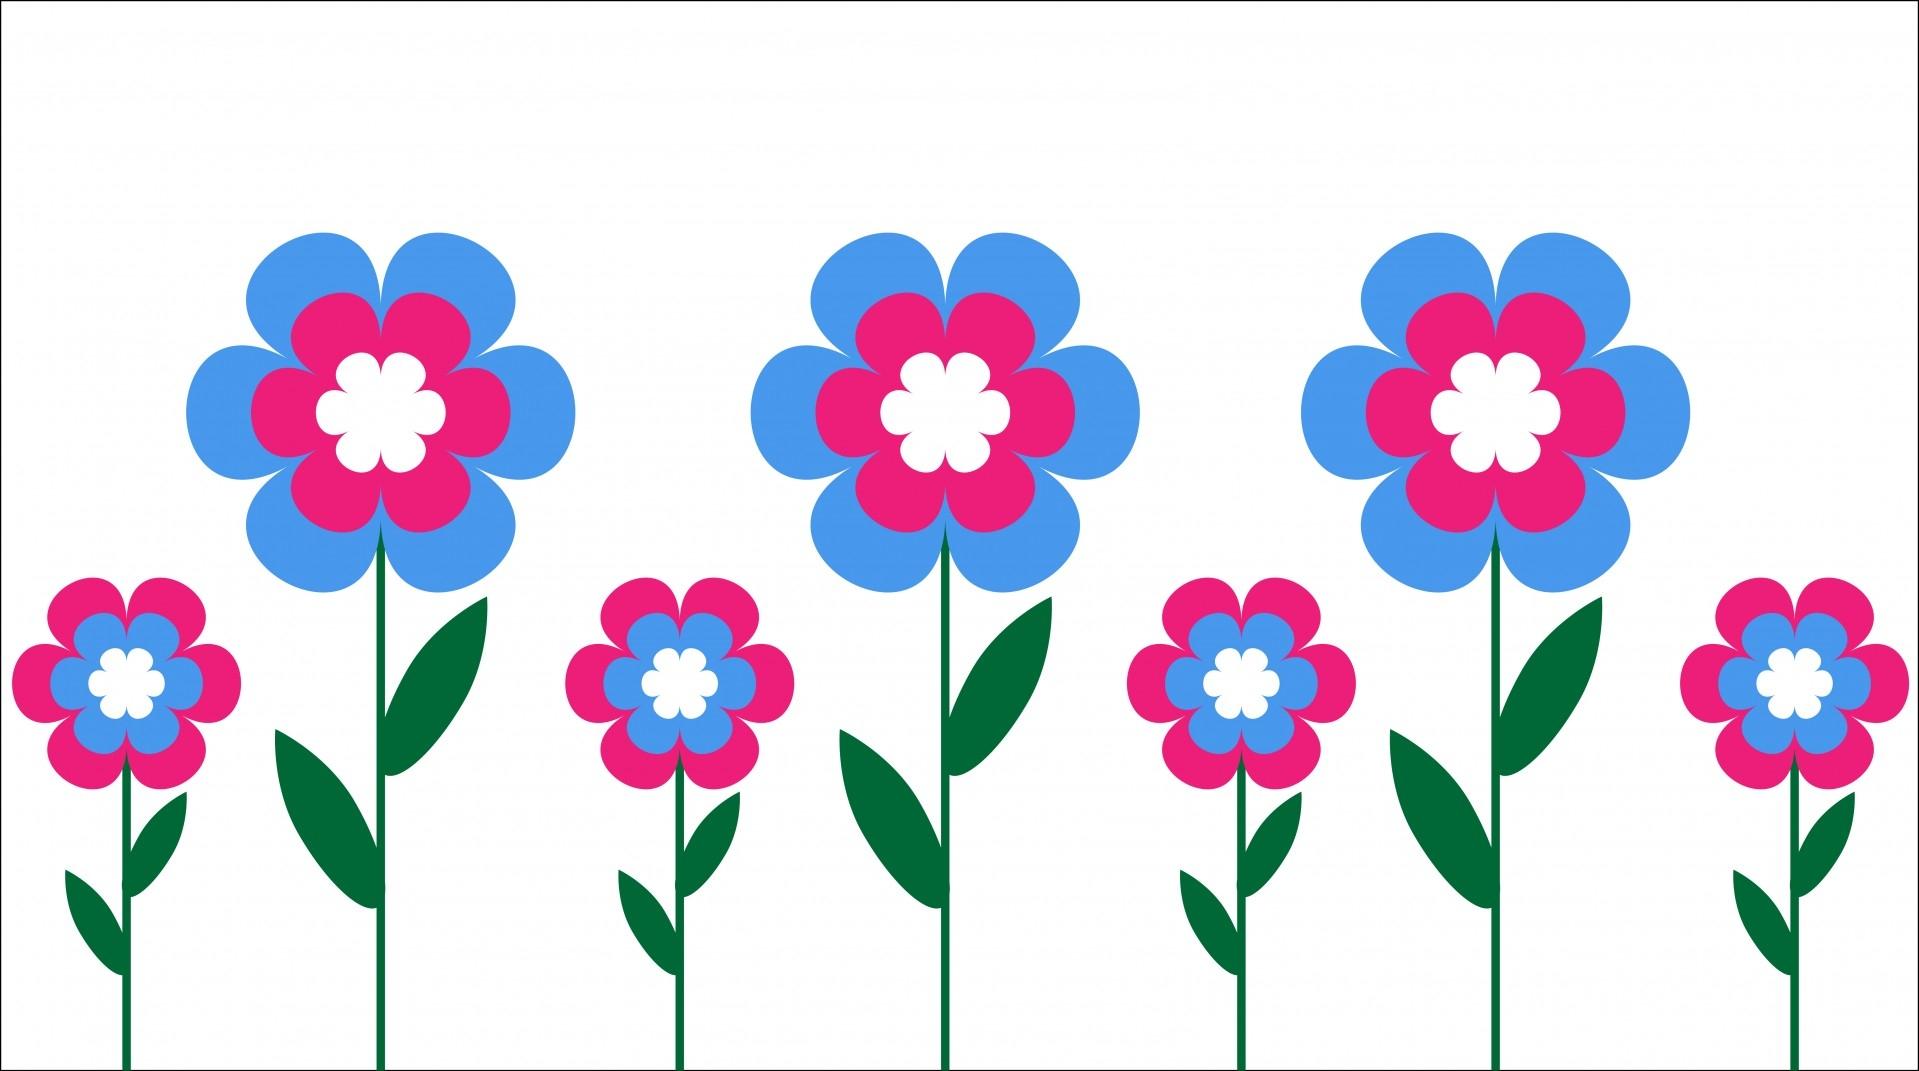 Clipart flowers free download clip art Clipart Flowers & Flowers Clip Art Images - ClipartALL.com clip art